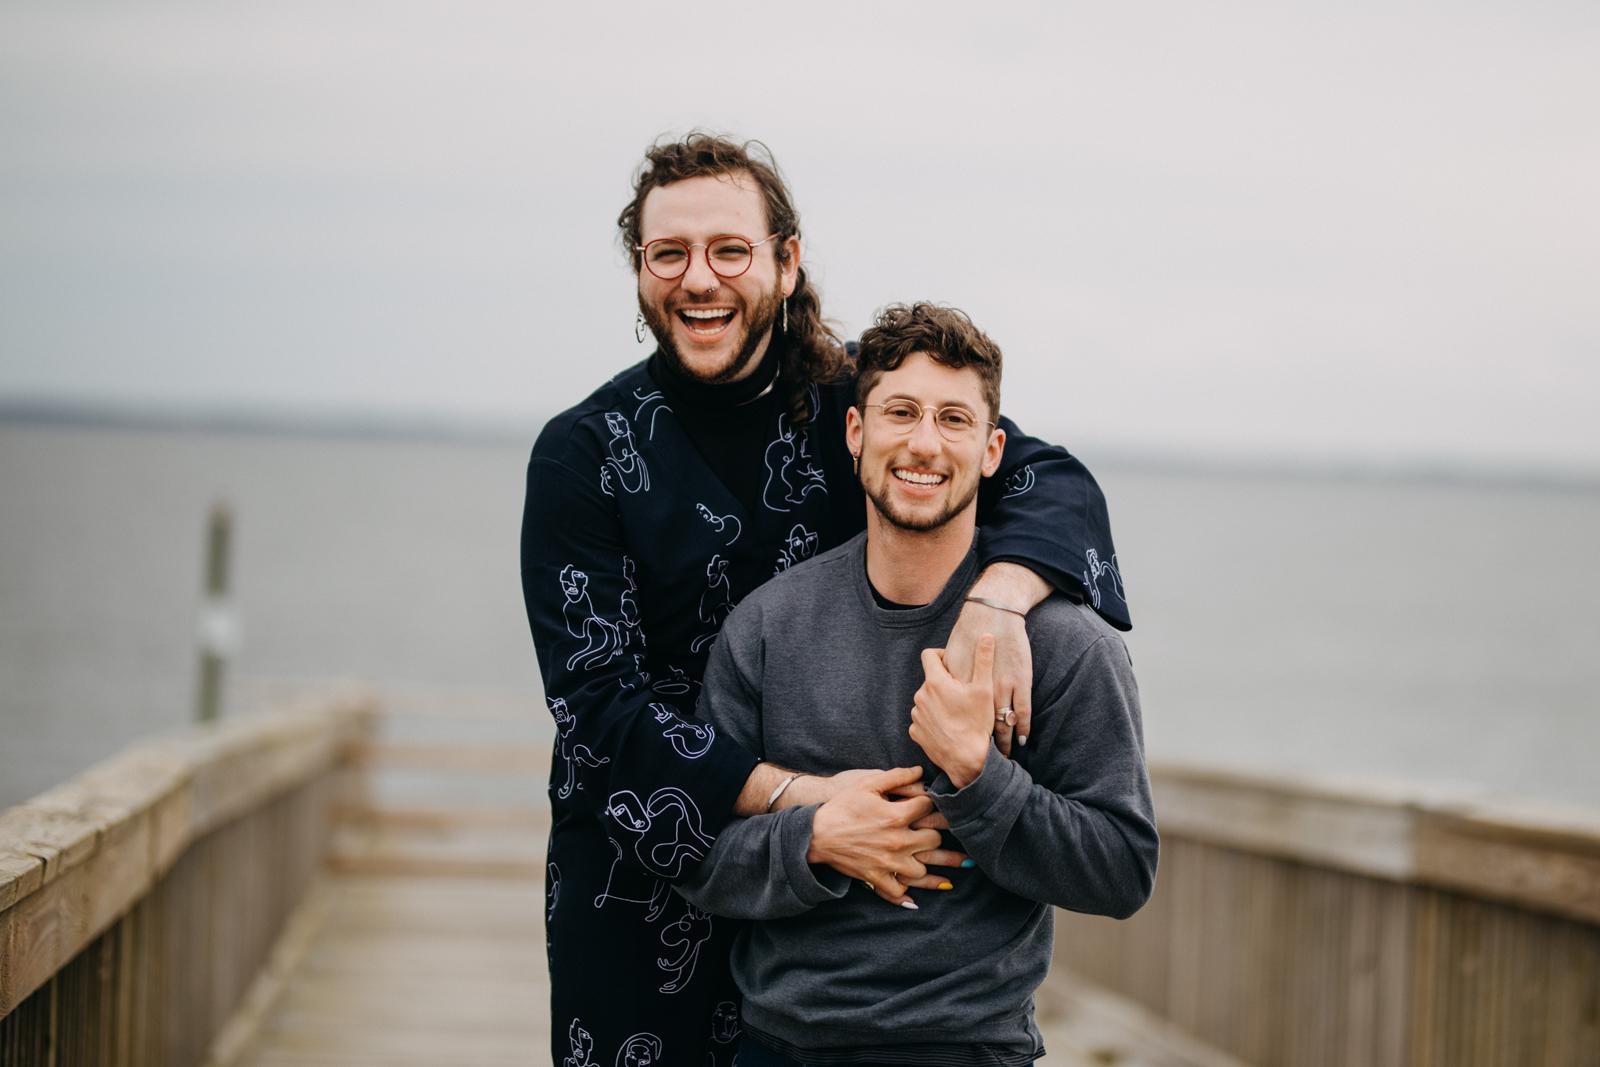 trans-couple-queer-photographer15.jpg